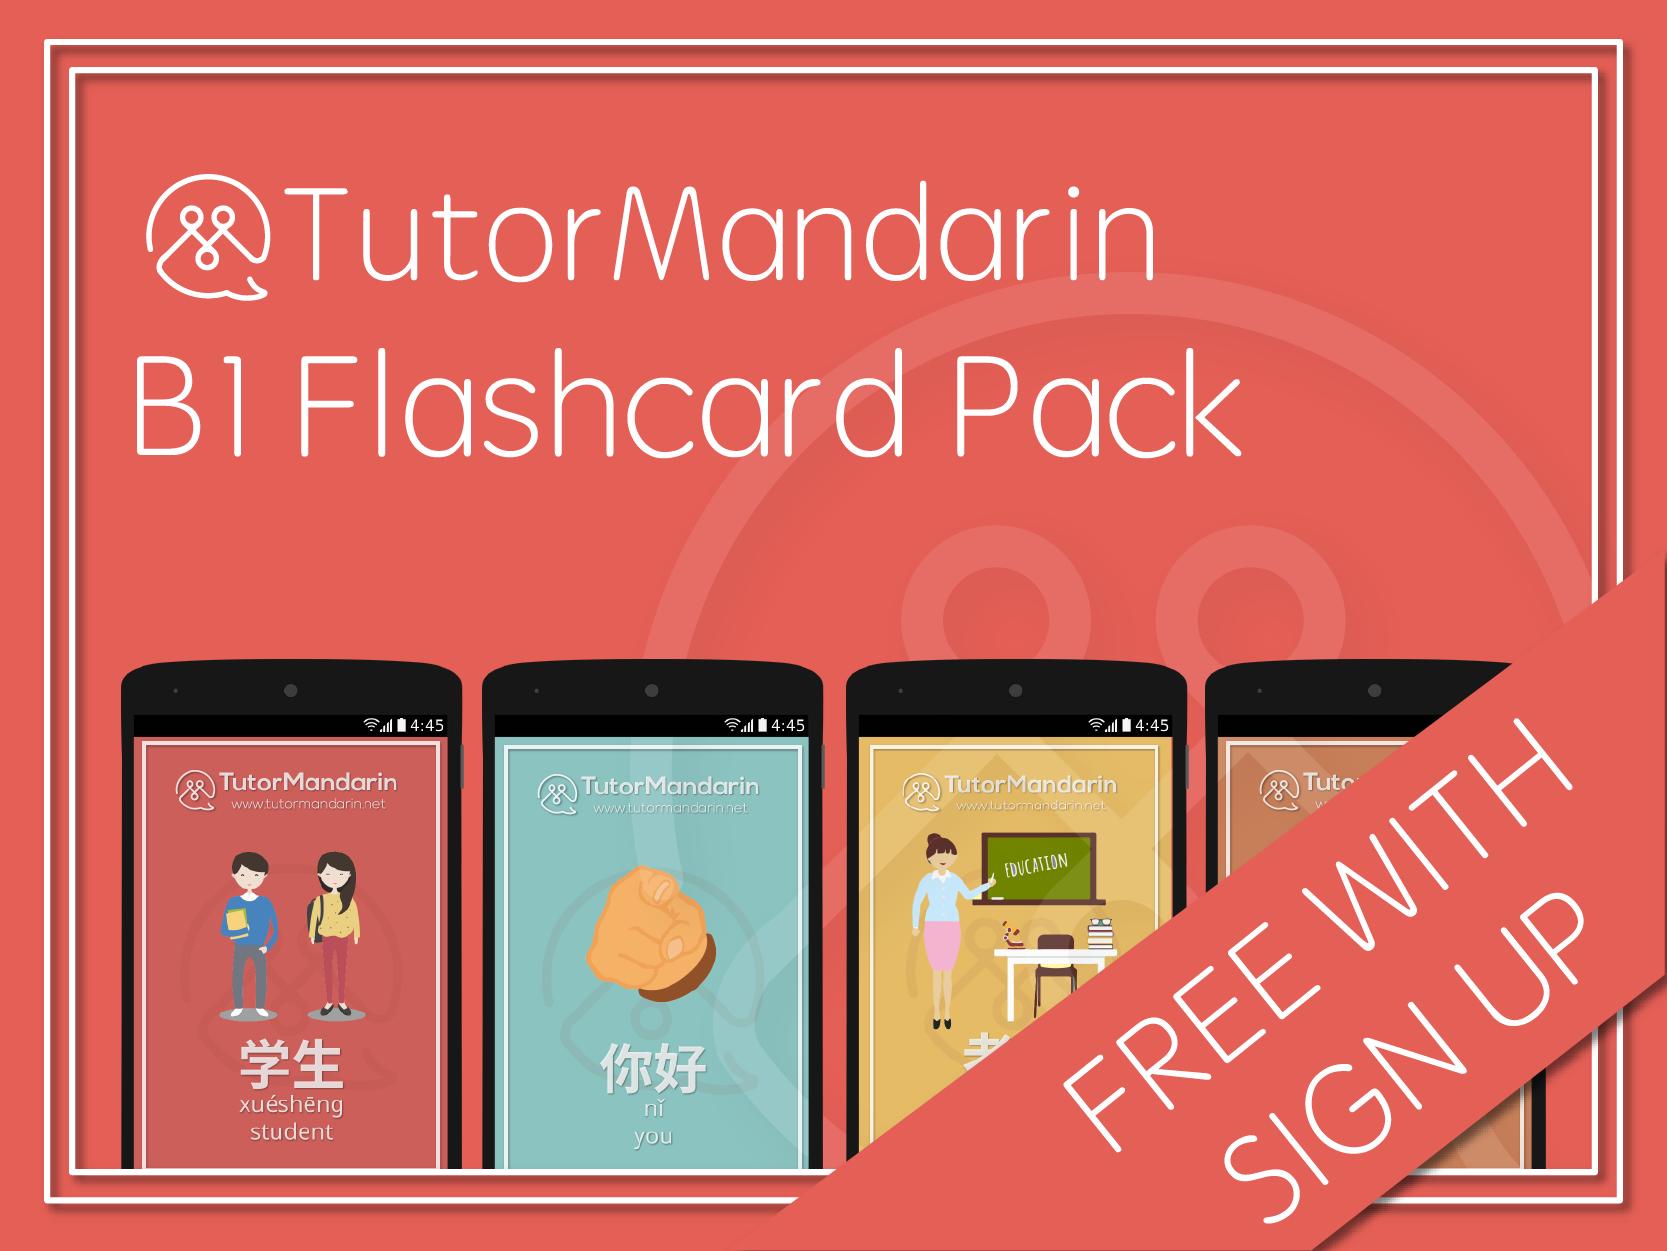 Free Chinese Lessons for Beginners | TutorMandarin: …